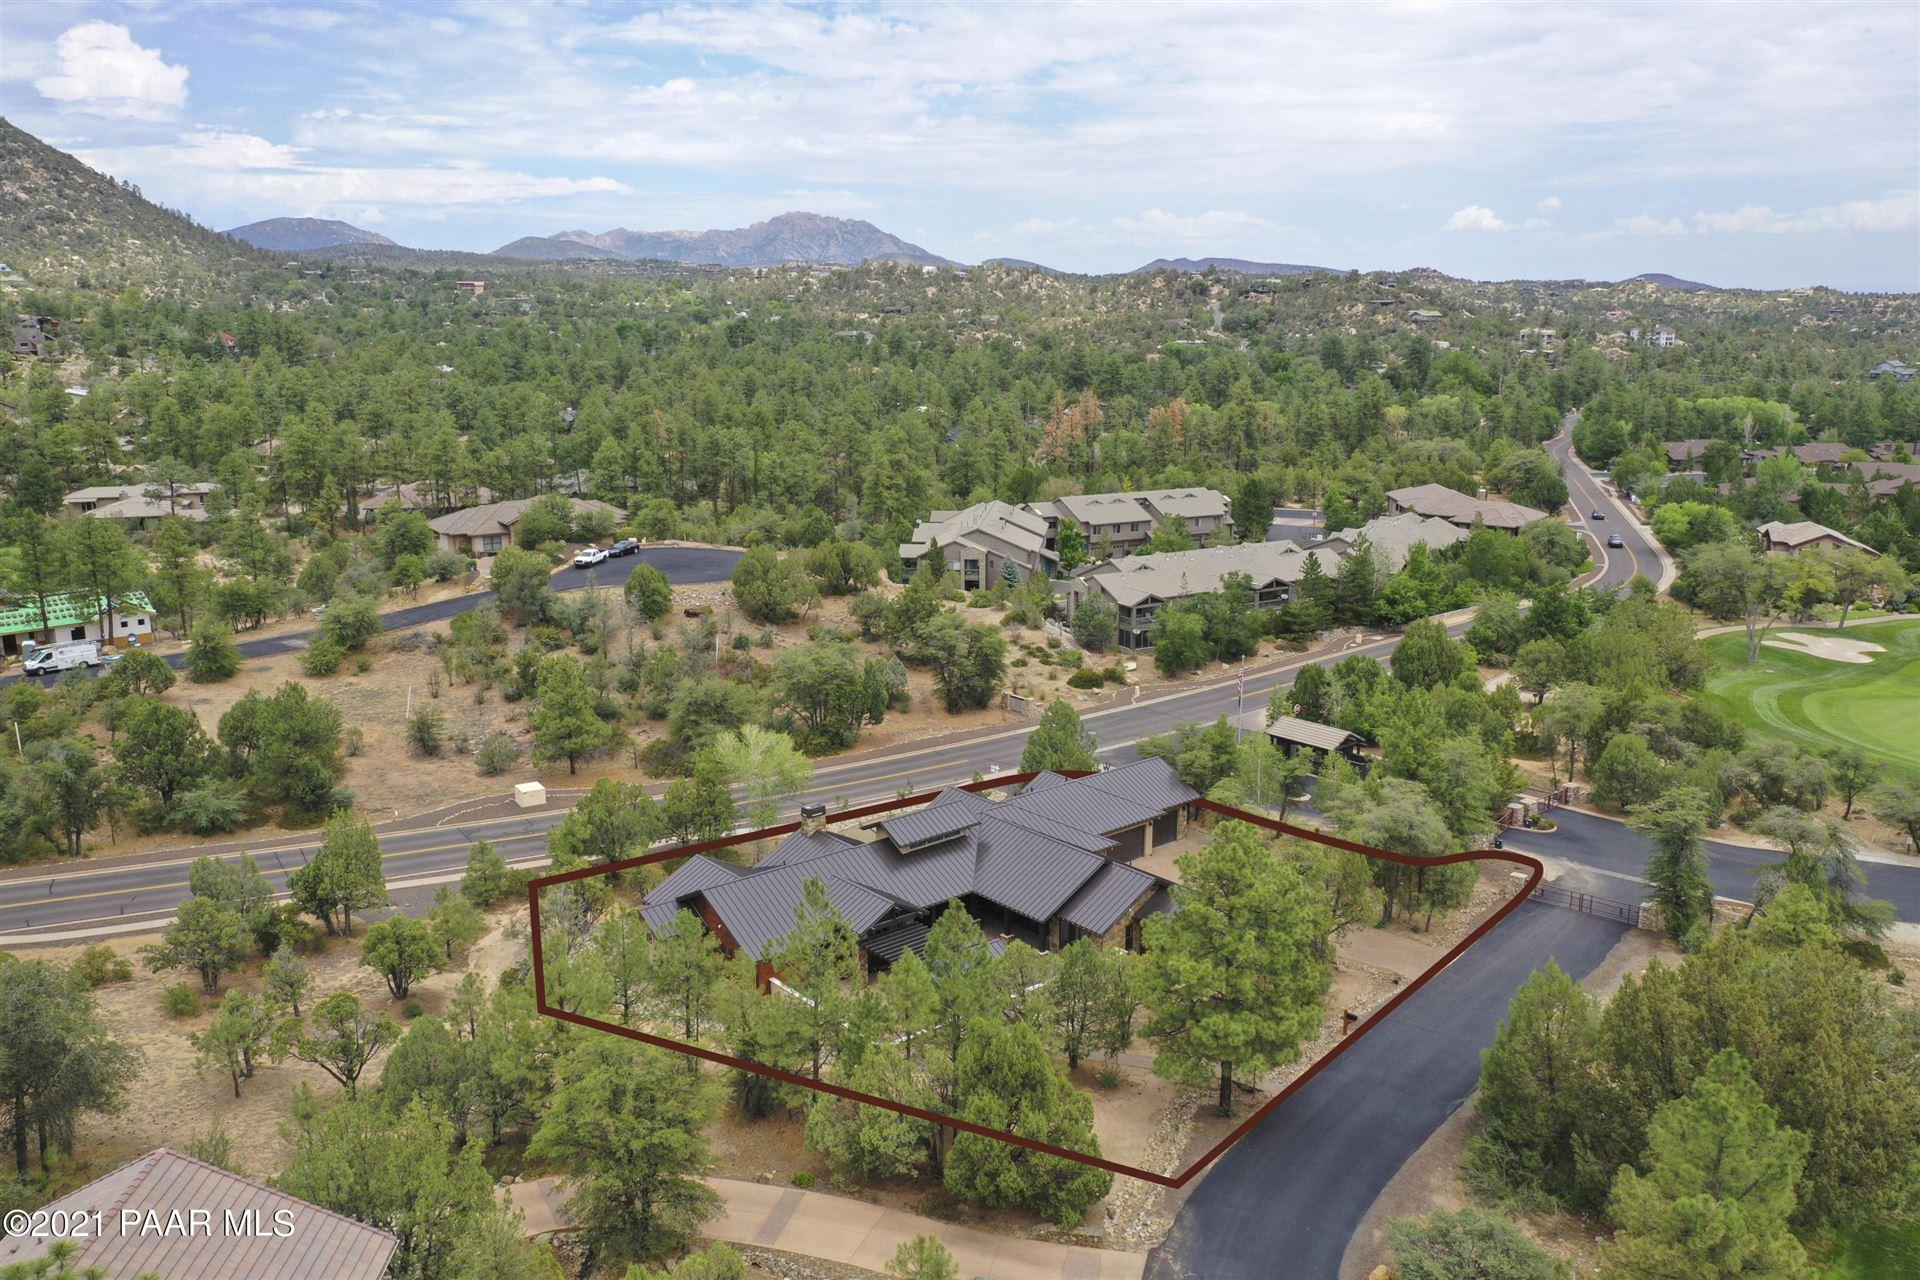 Photo of 1725 Conifer Ridge Lane #Lot: 1, Prescott, AZ 86303 (MLS # 1039480)